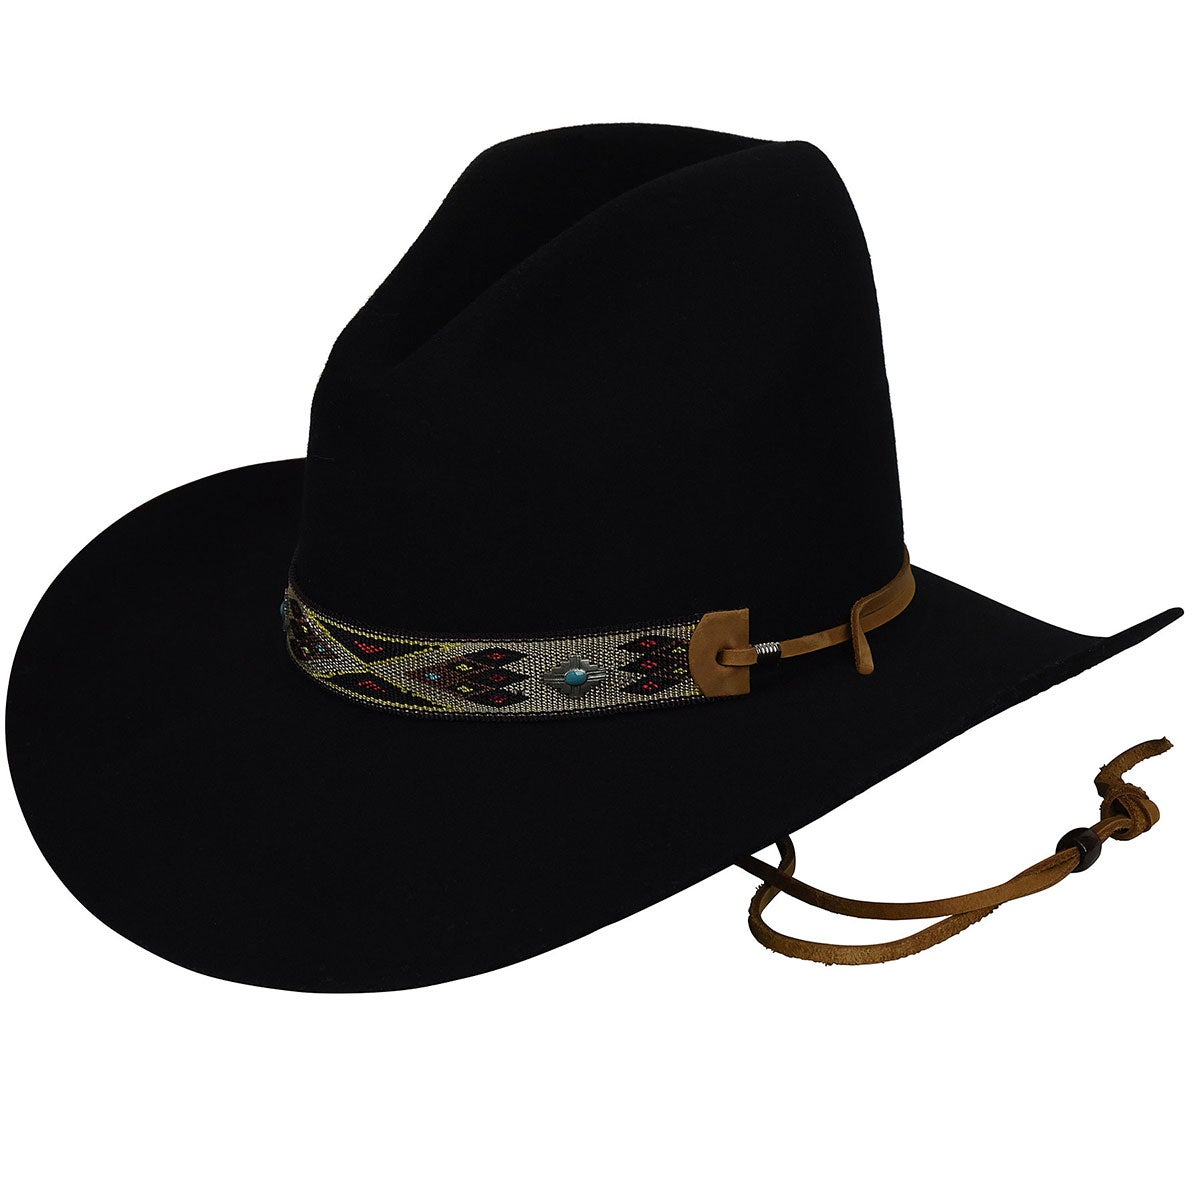 Renegade Renegade by Bailey Hickstead Western Hat in Black